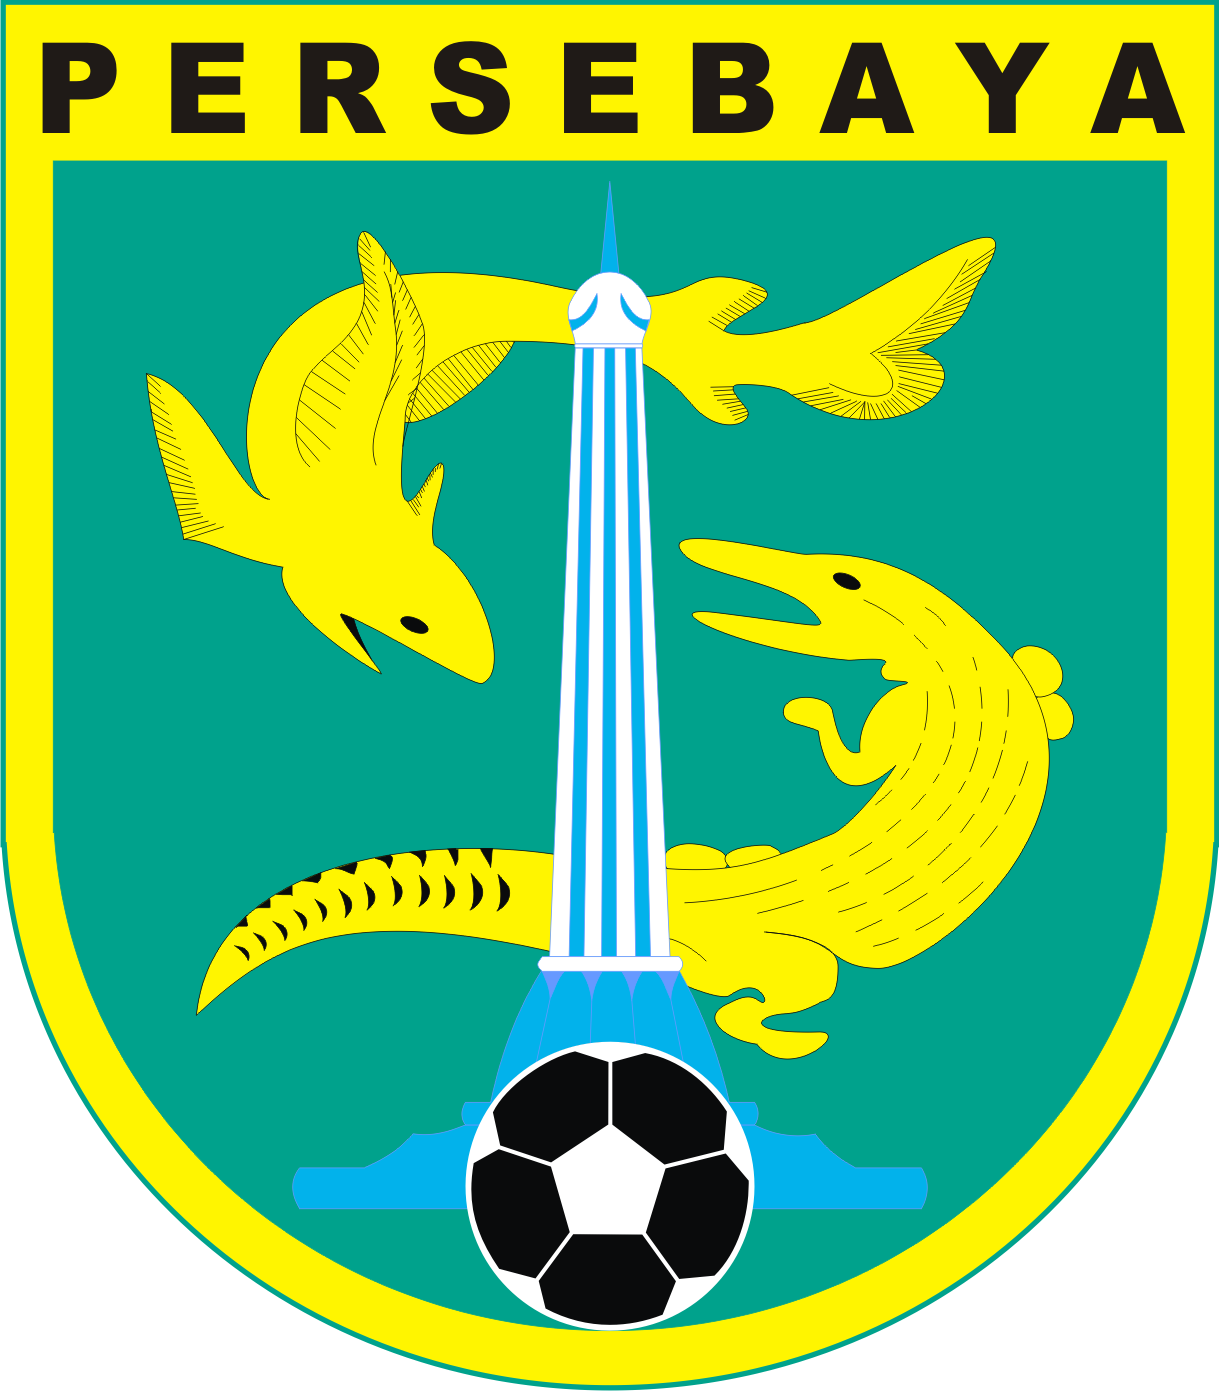 Logo Persebaya Surabaya Ardi La Madi Blog Persatuan Sepak Bola